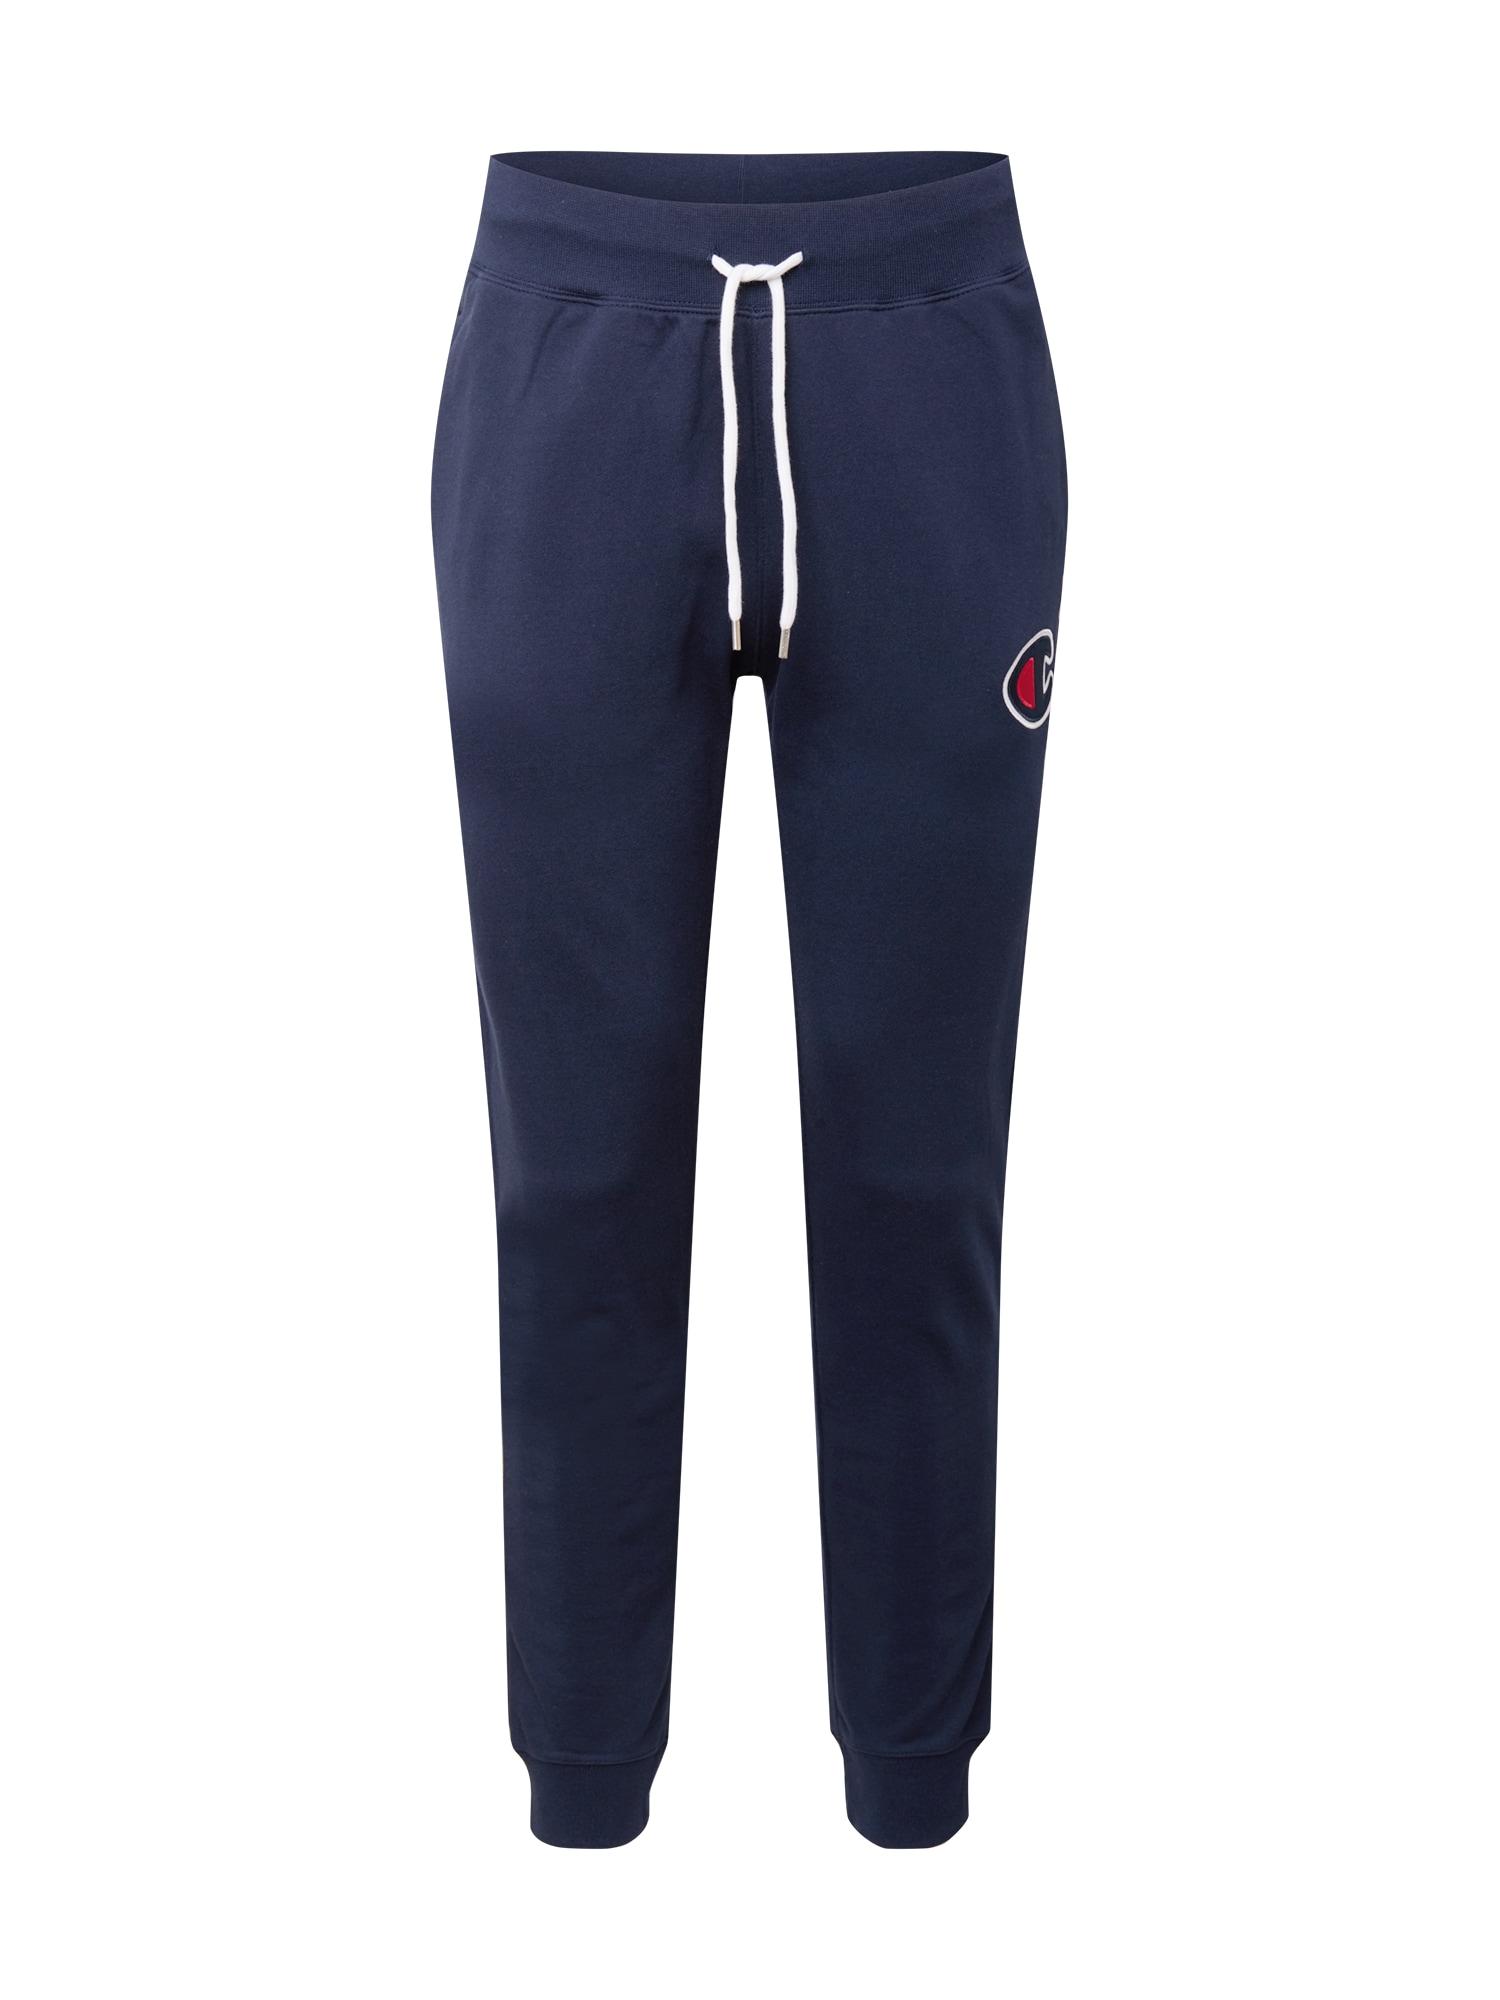 Champion Authentic Athletic Apparel Kelnės tamsiai mėlyna / balta / raudona